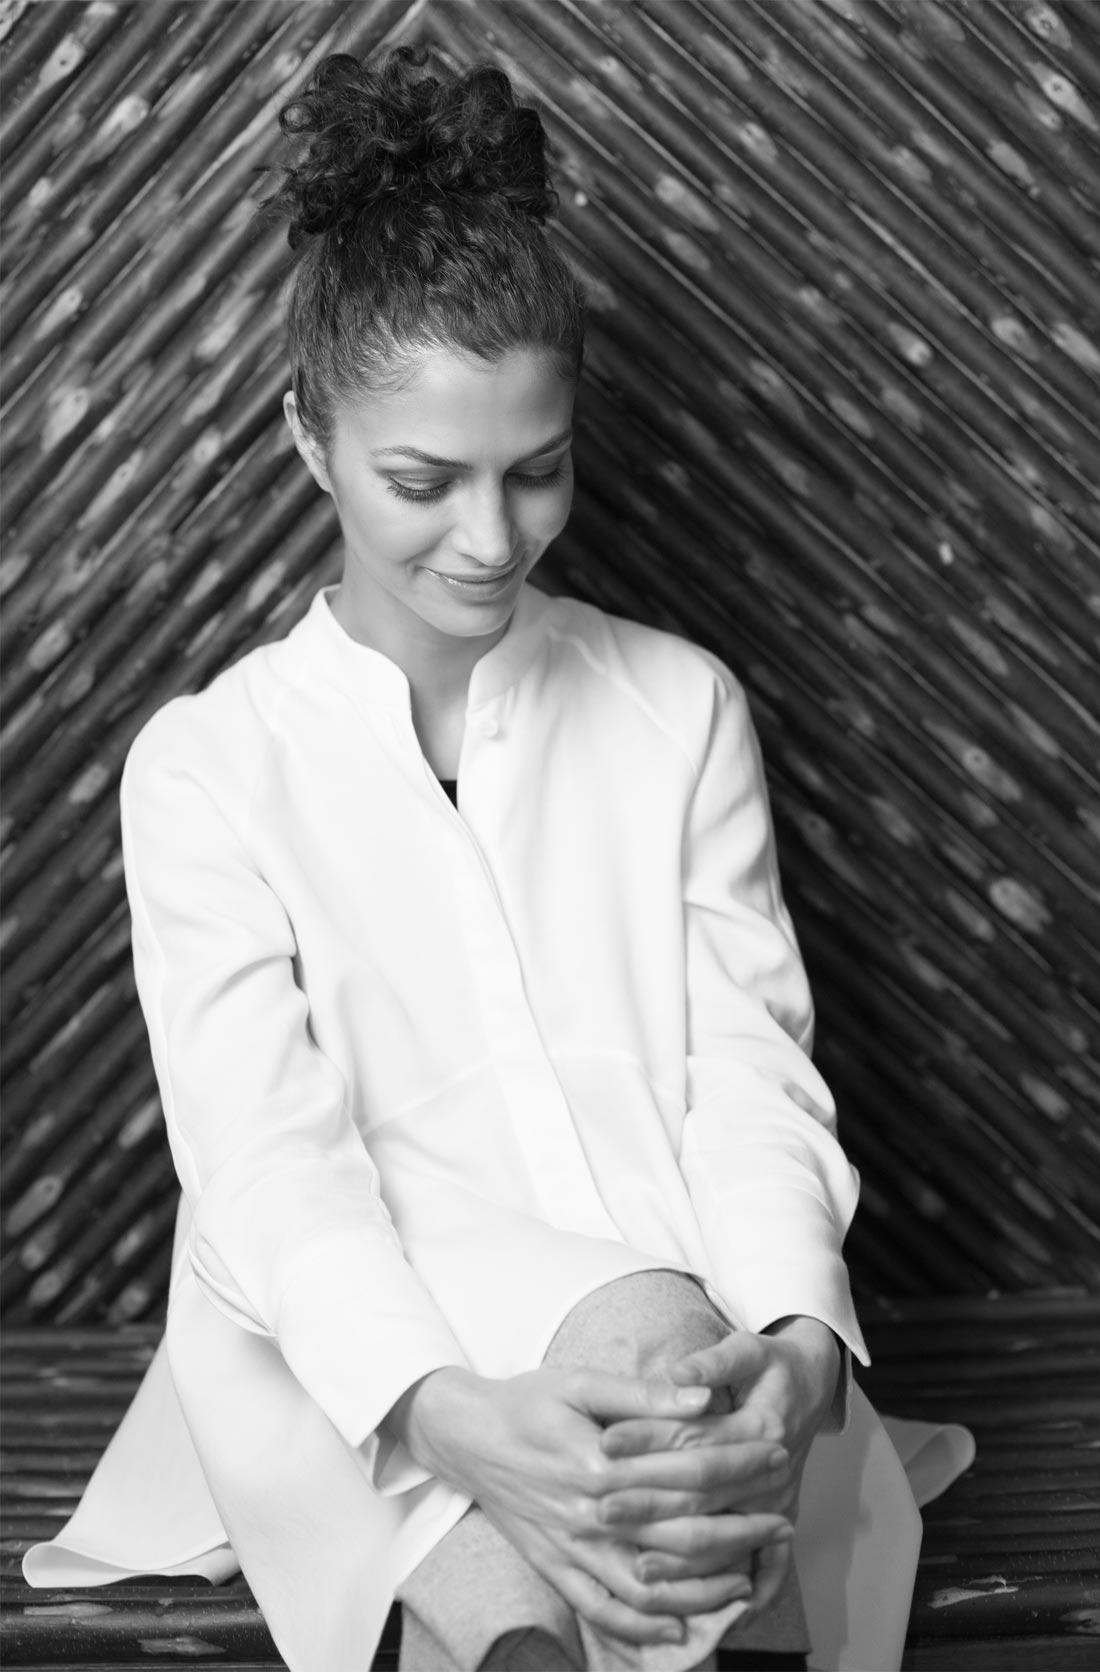 Nobieh Talaei | Photo by Sonja Stadelmaier